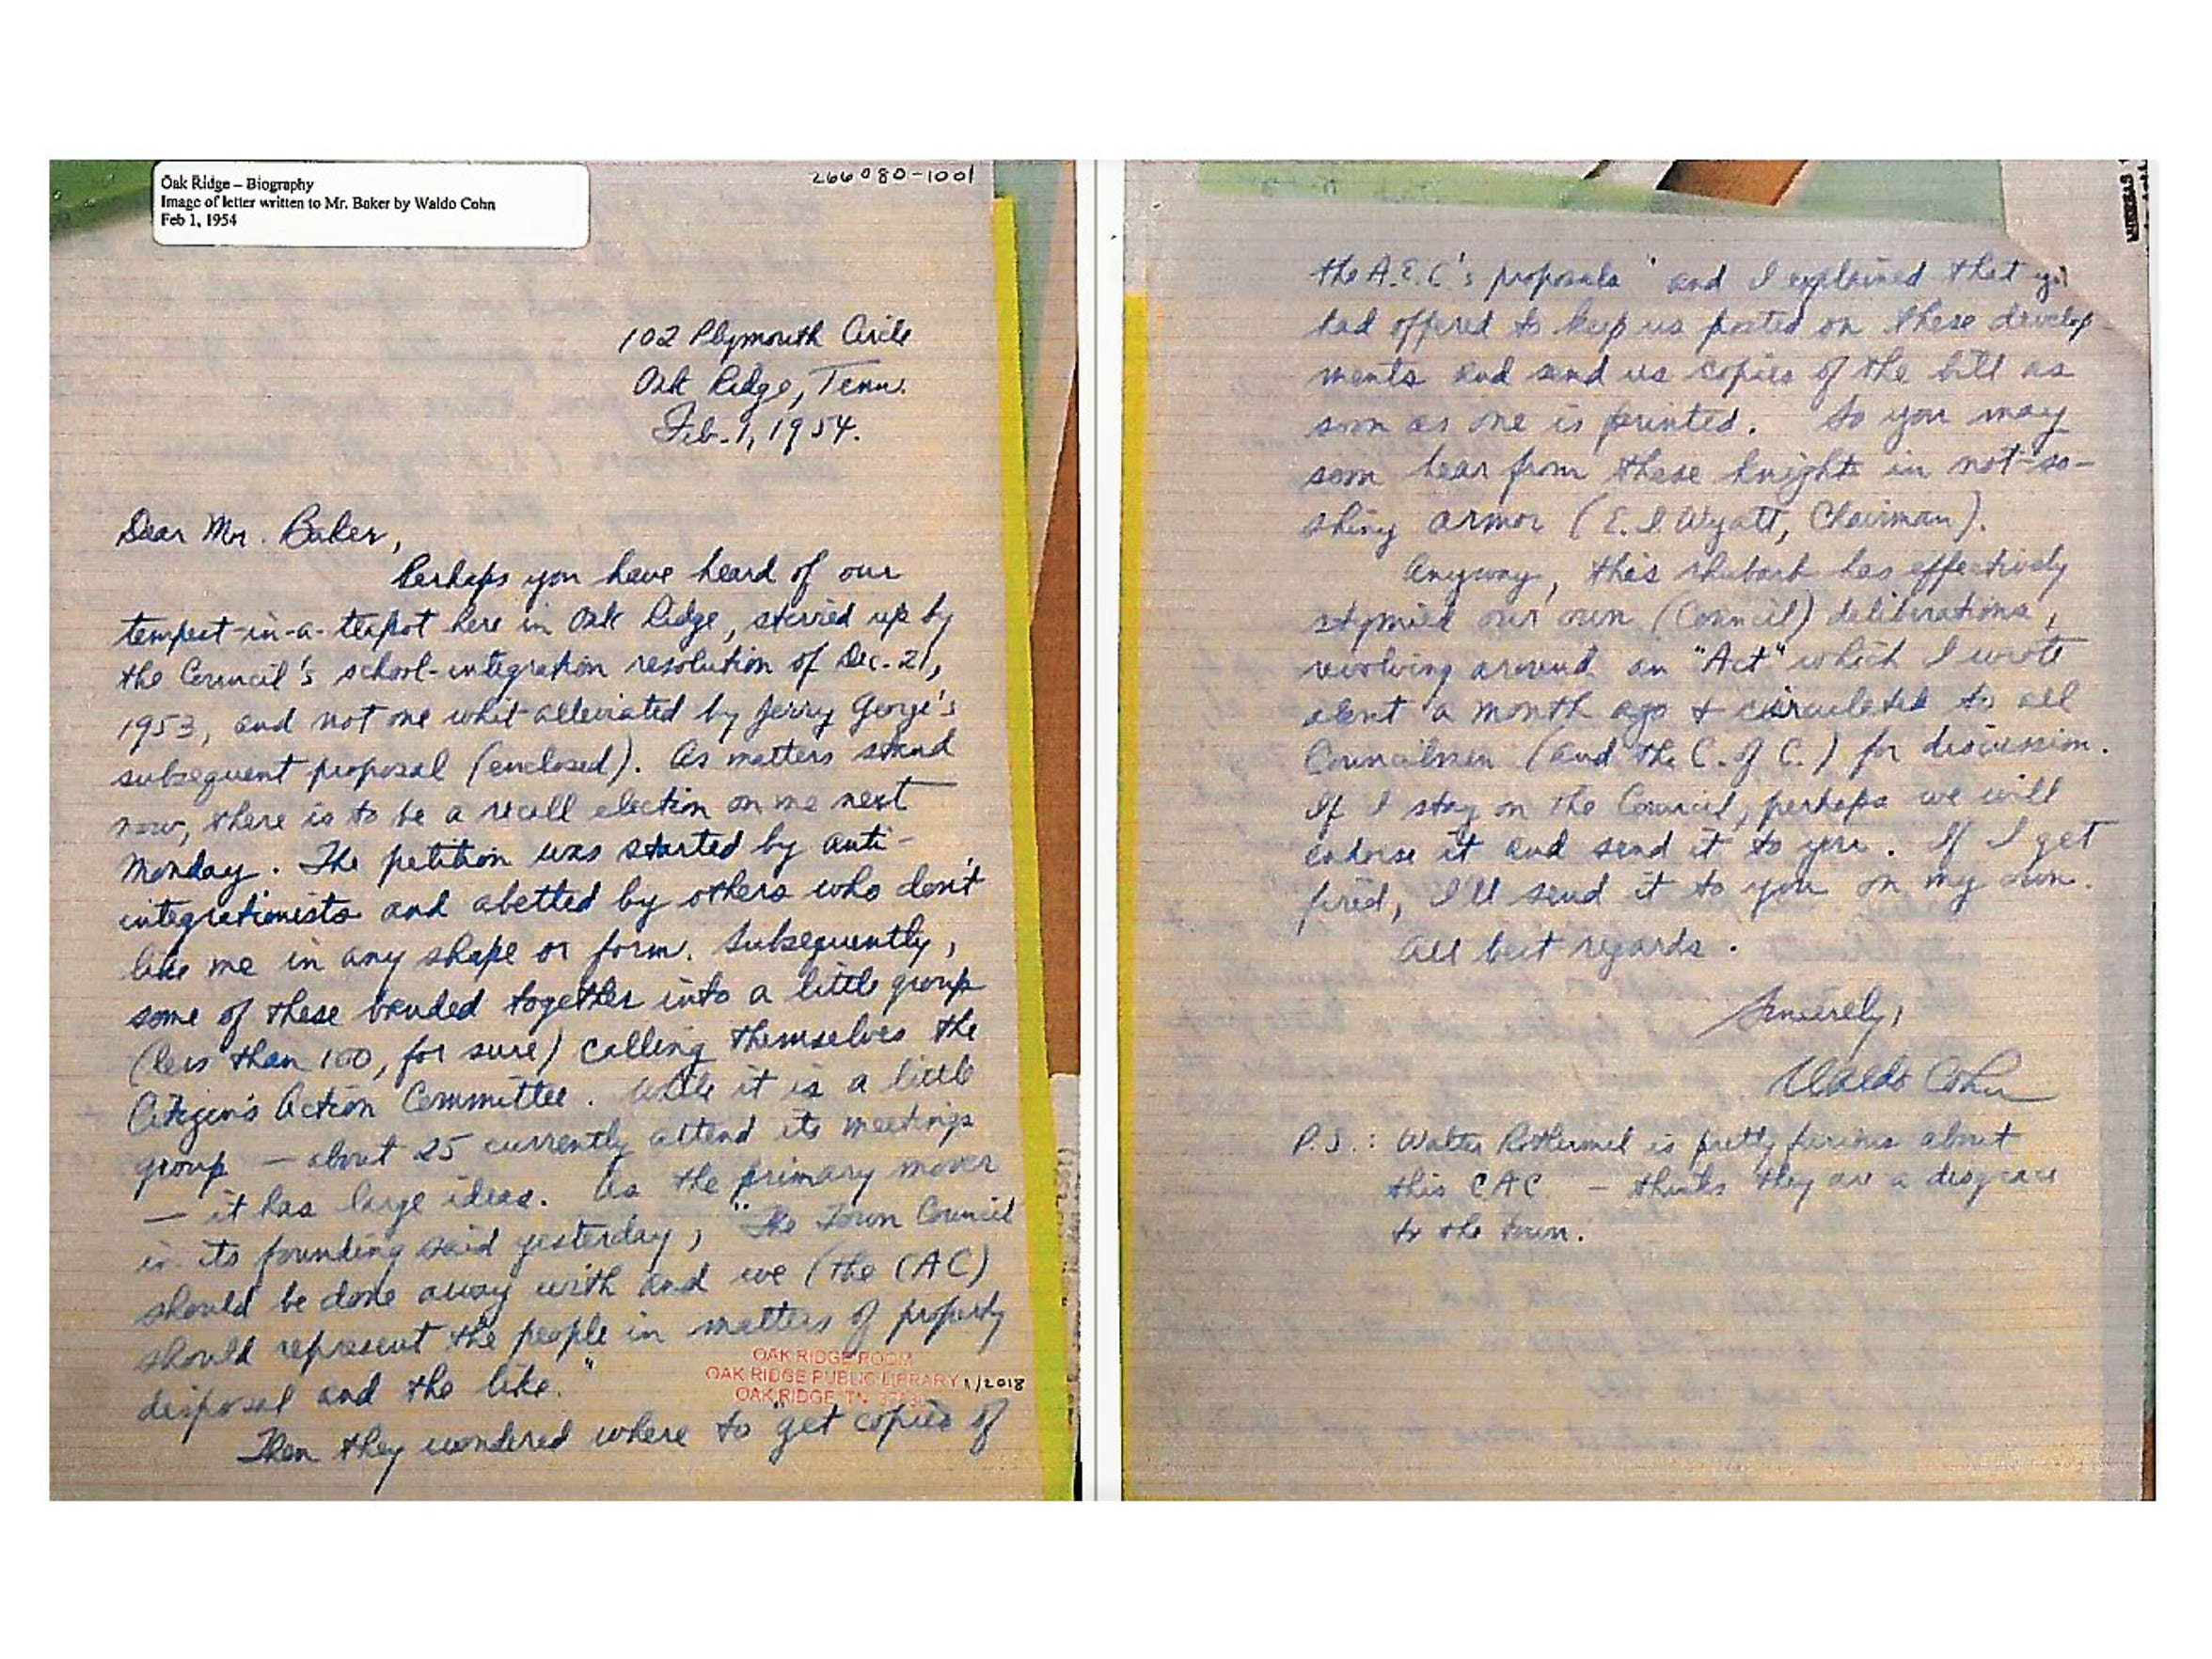 Oak Ridge Councilman Waldo Cohn wrote to U.S. Rep.